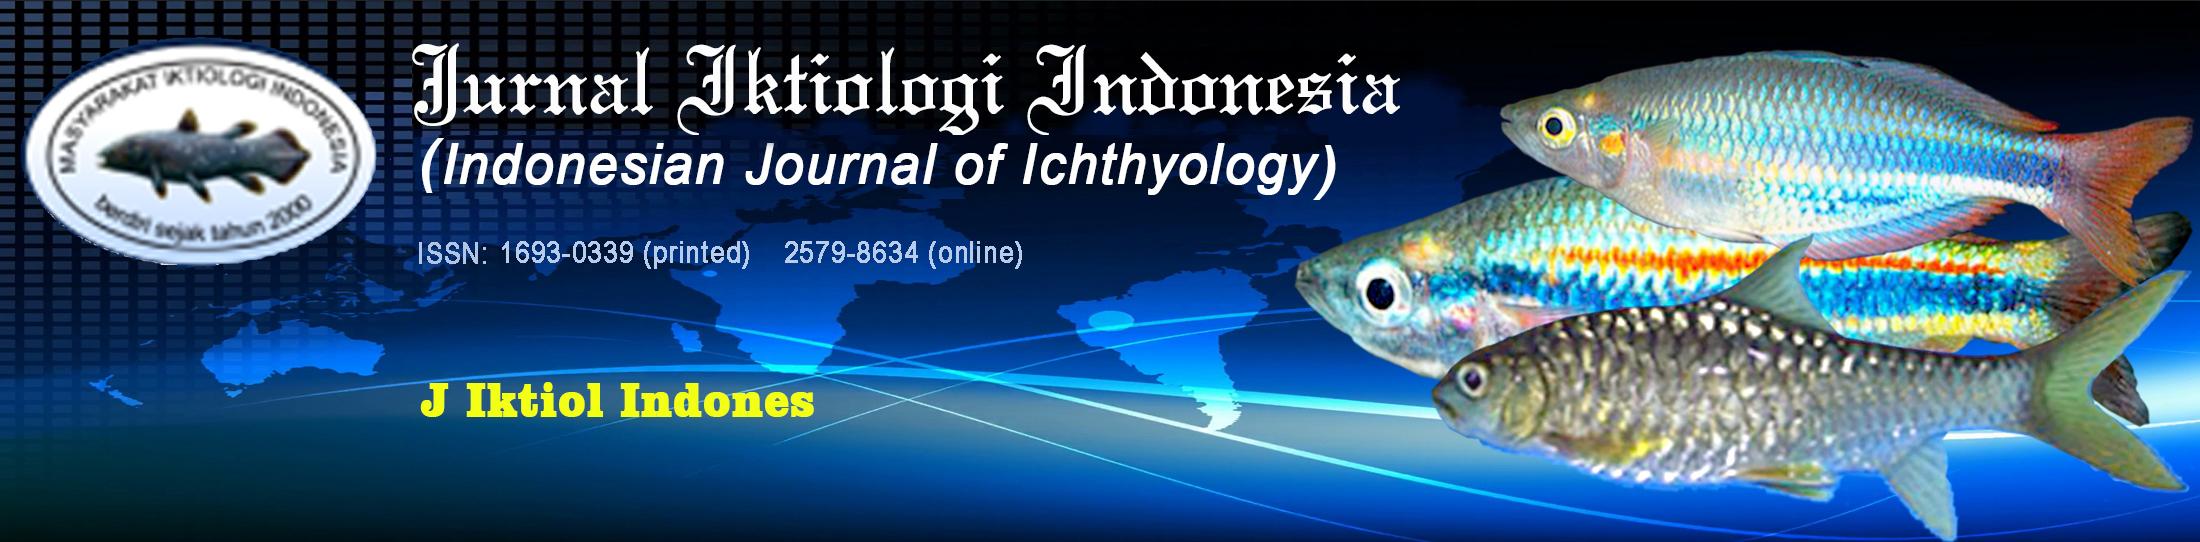 Jurnal Iktiologi Indonesia